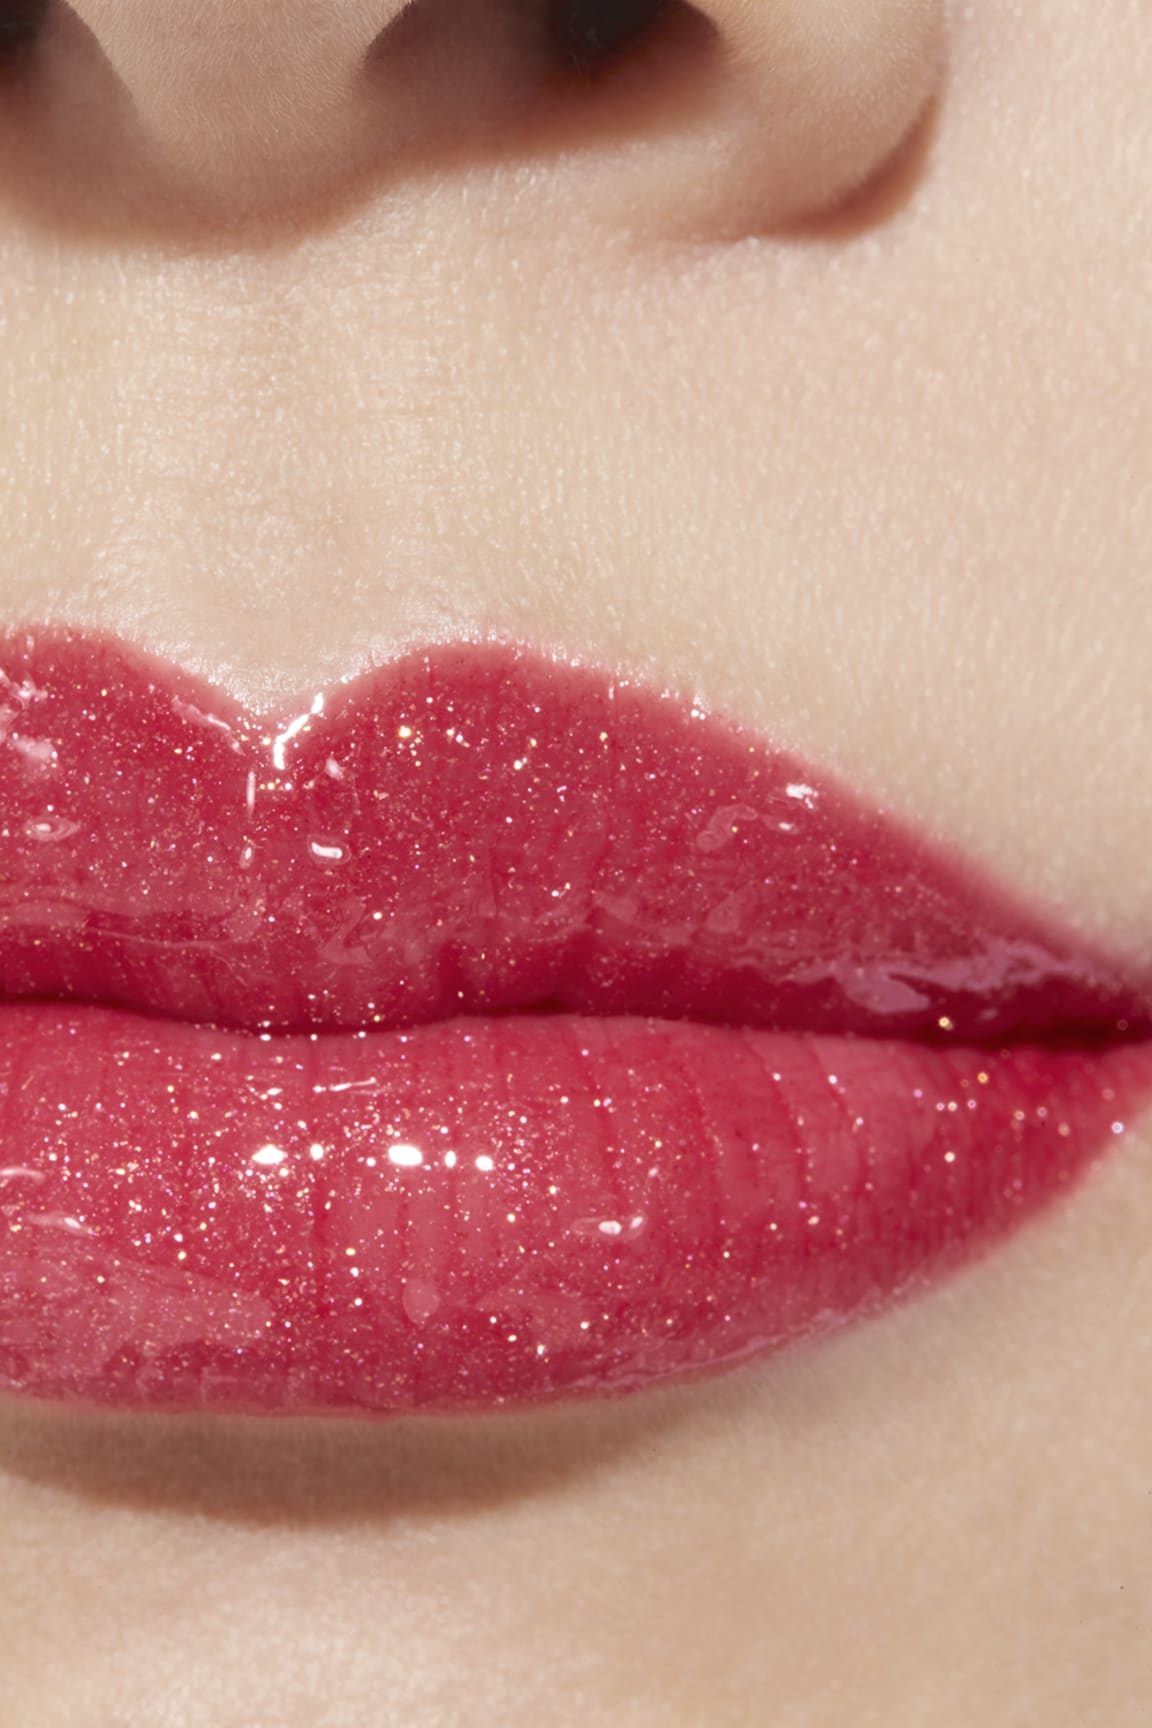 Application makeup visual 1 - ROUGE COCO GLOSS 106 - AMARENA